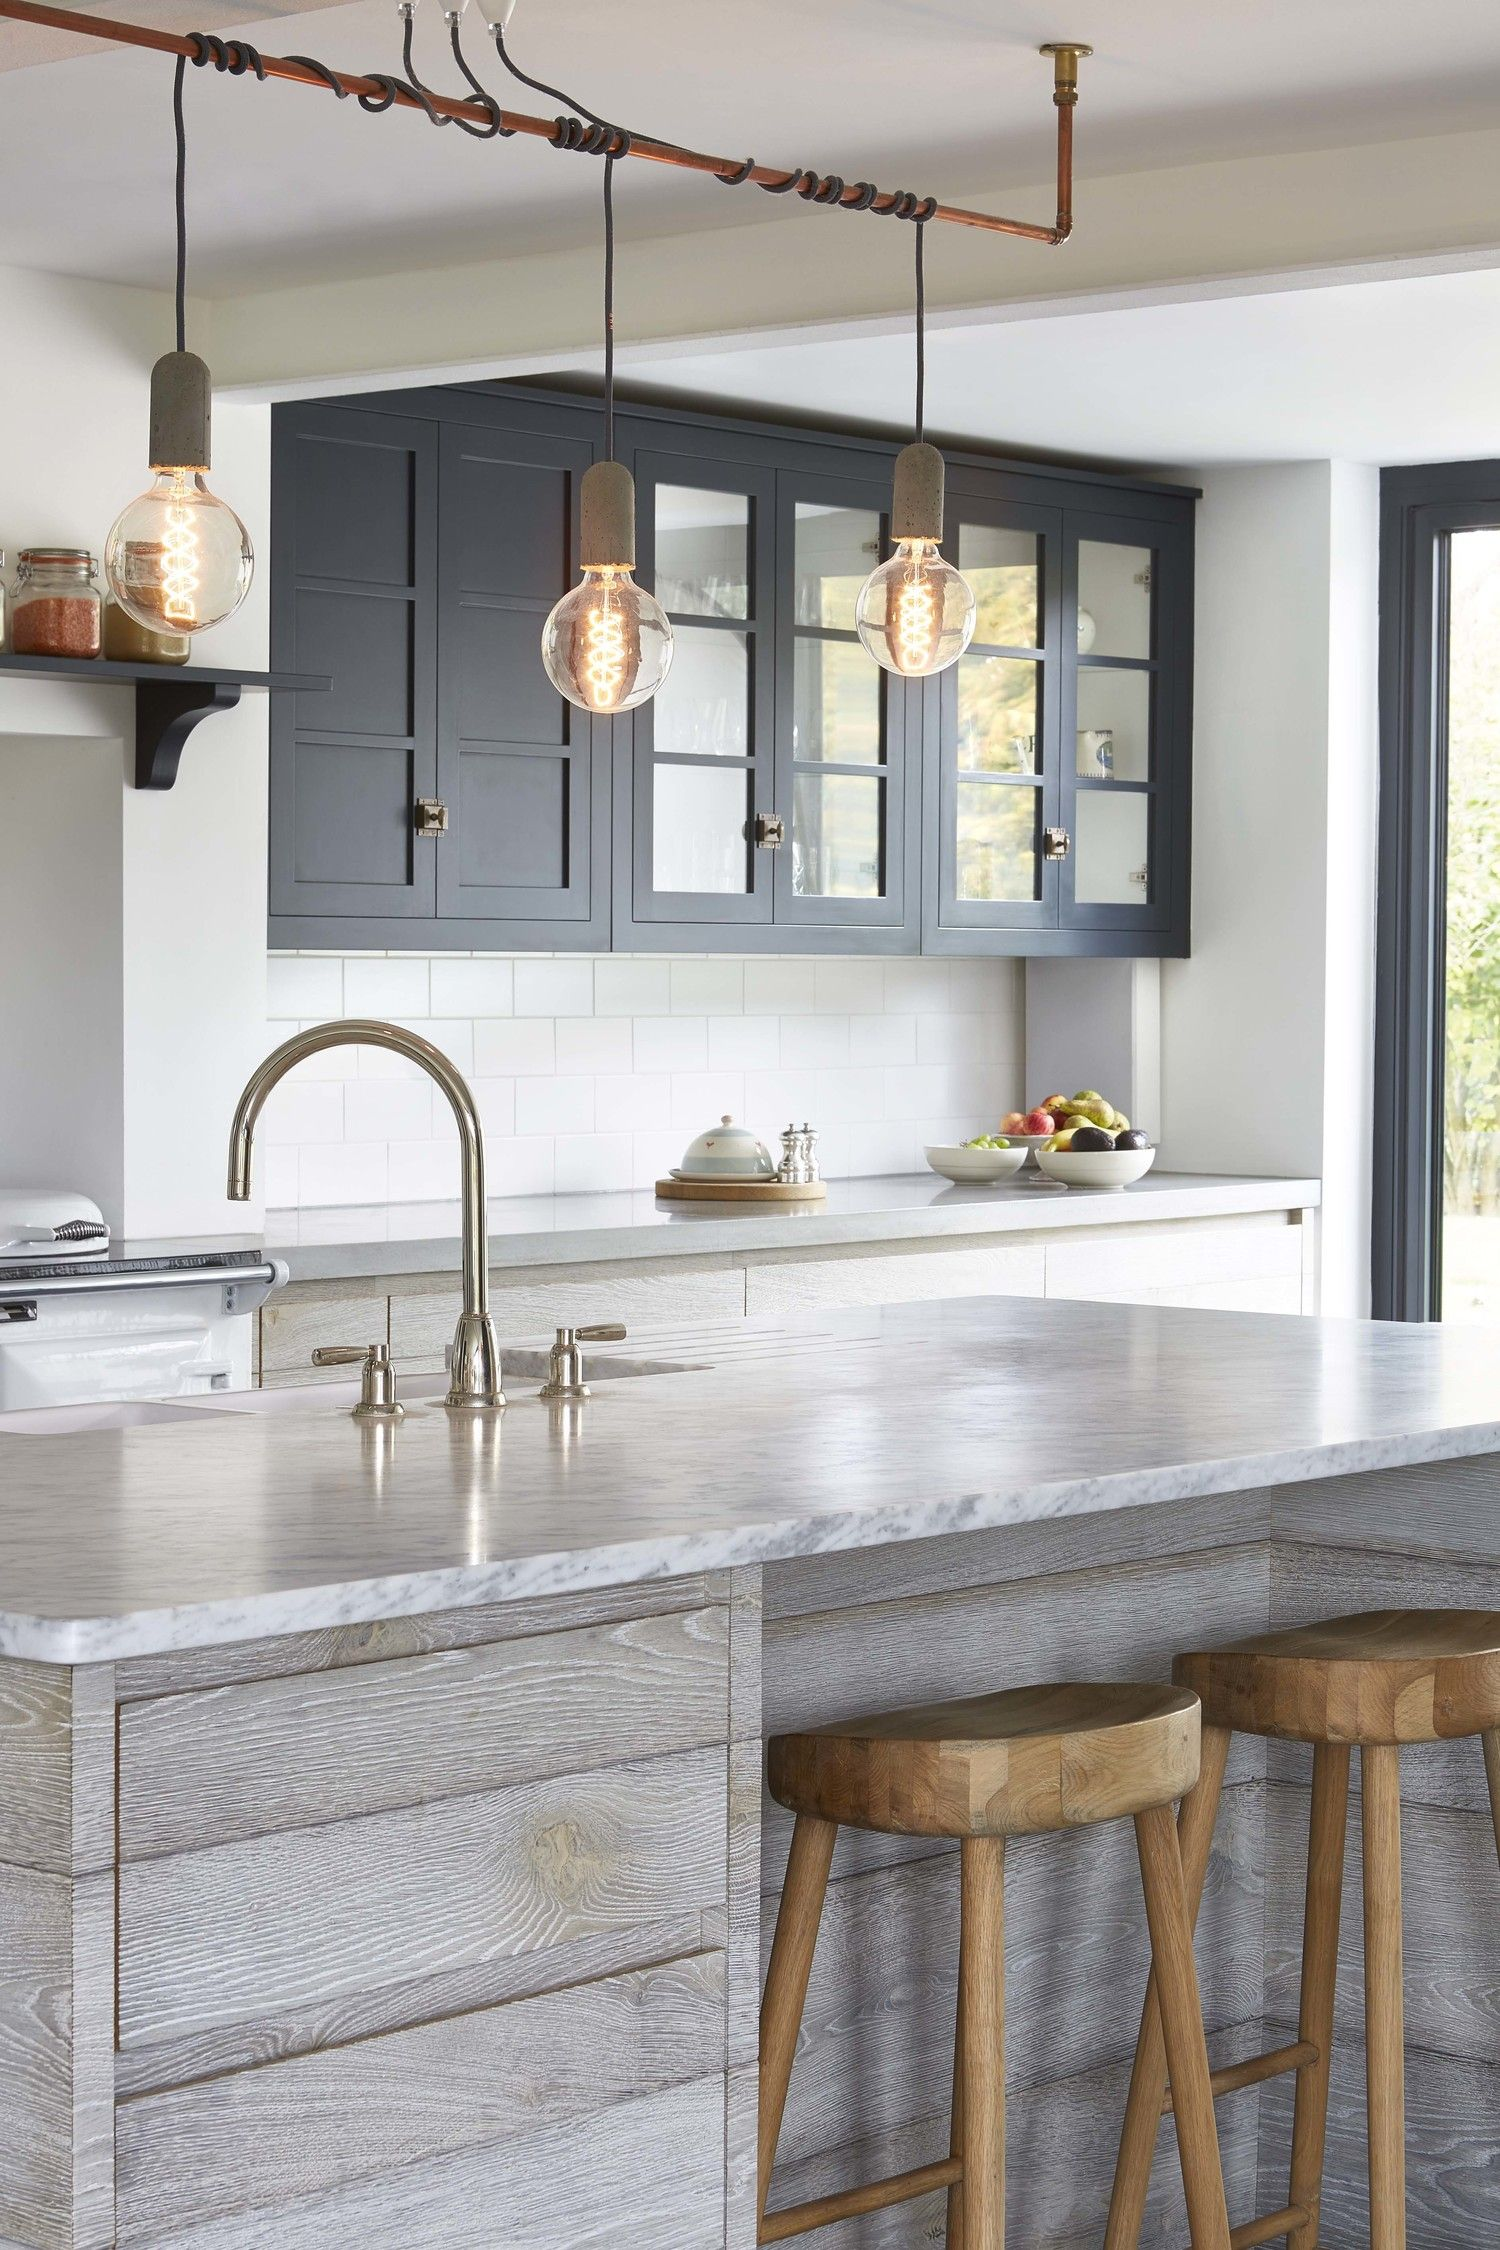 Blakes 22 10 1540186 Jpg Industrial Style Kitchen Rustic